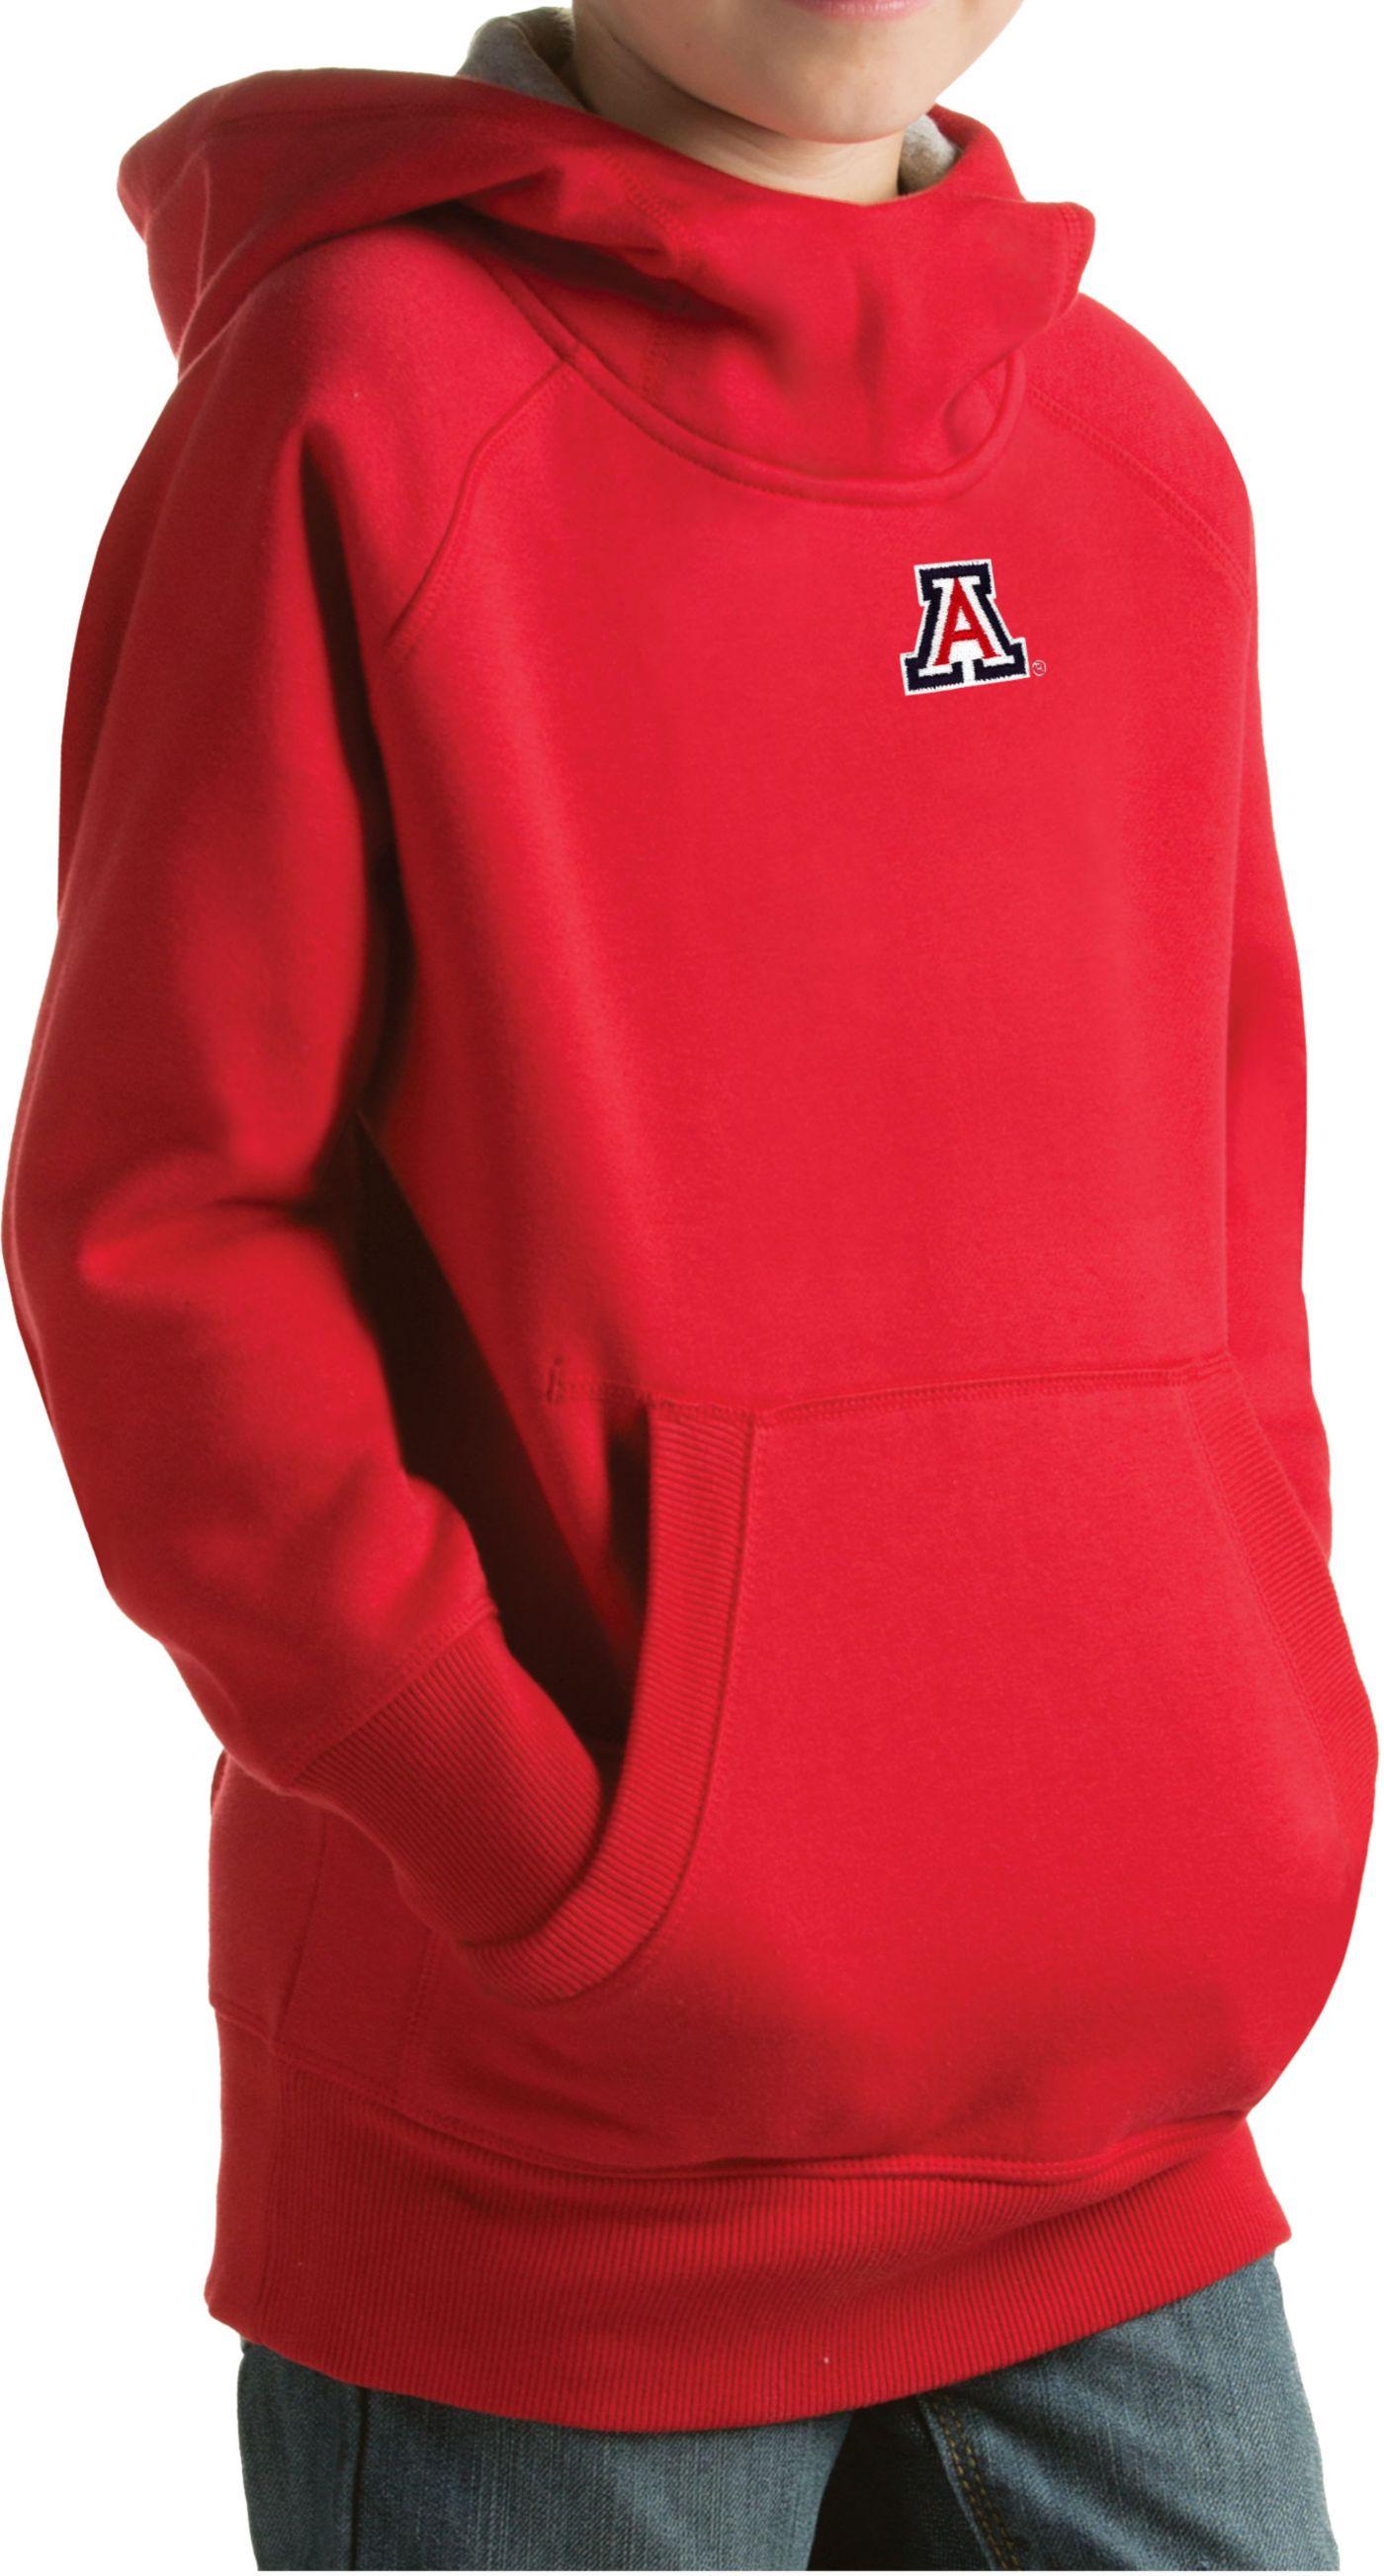 Antigua Youth Arizona Wildcats Cardinal Victory Pullover Hoodie